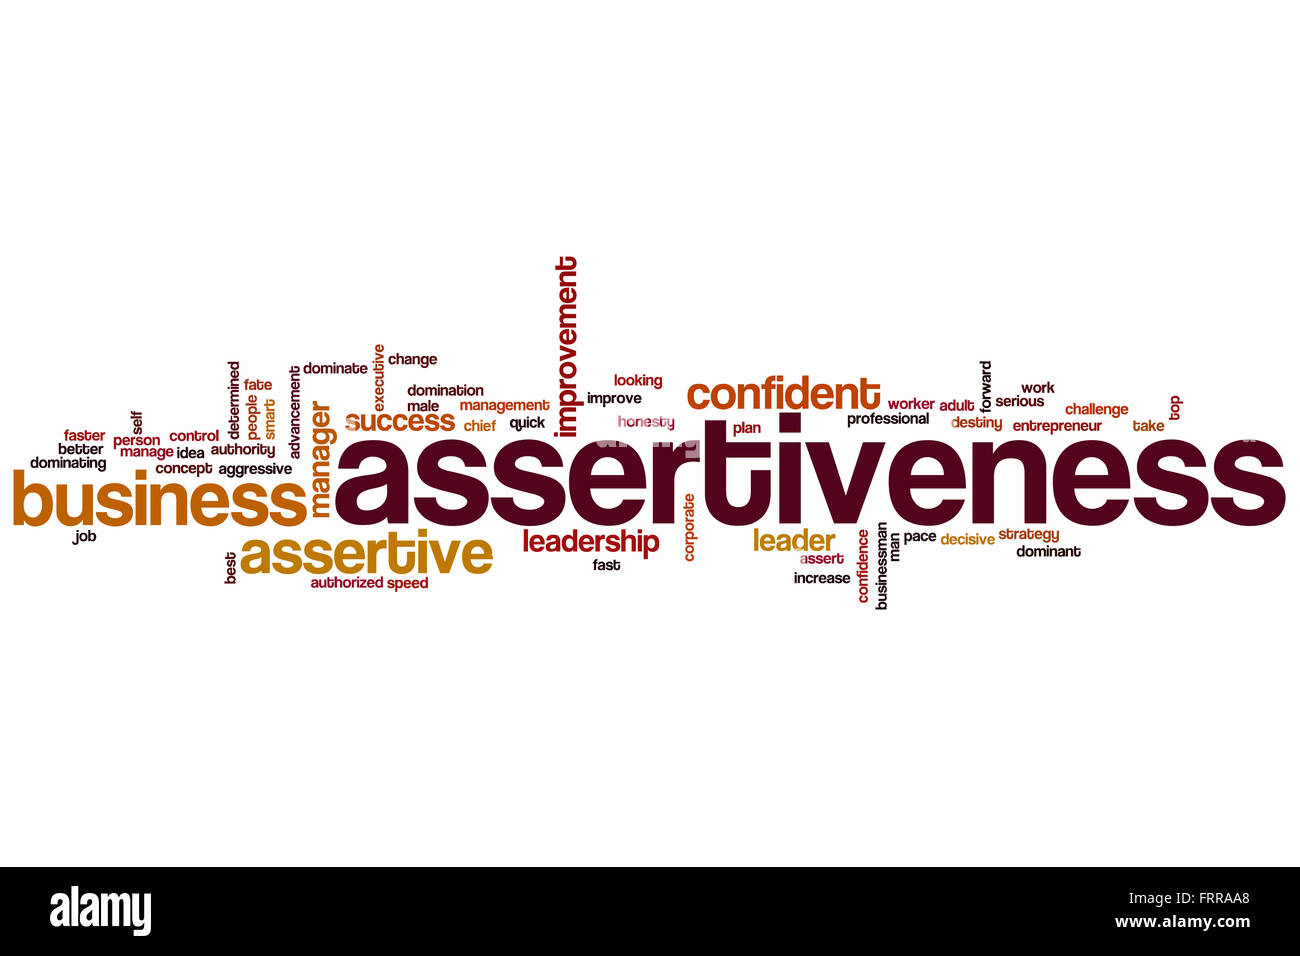 Assertiveness Word Cloud Concept Stock Photo